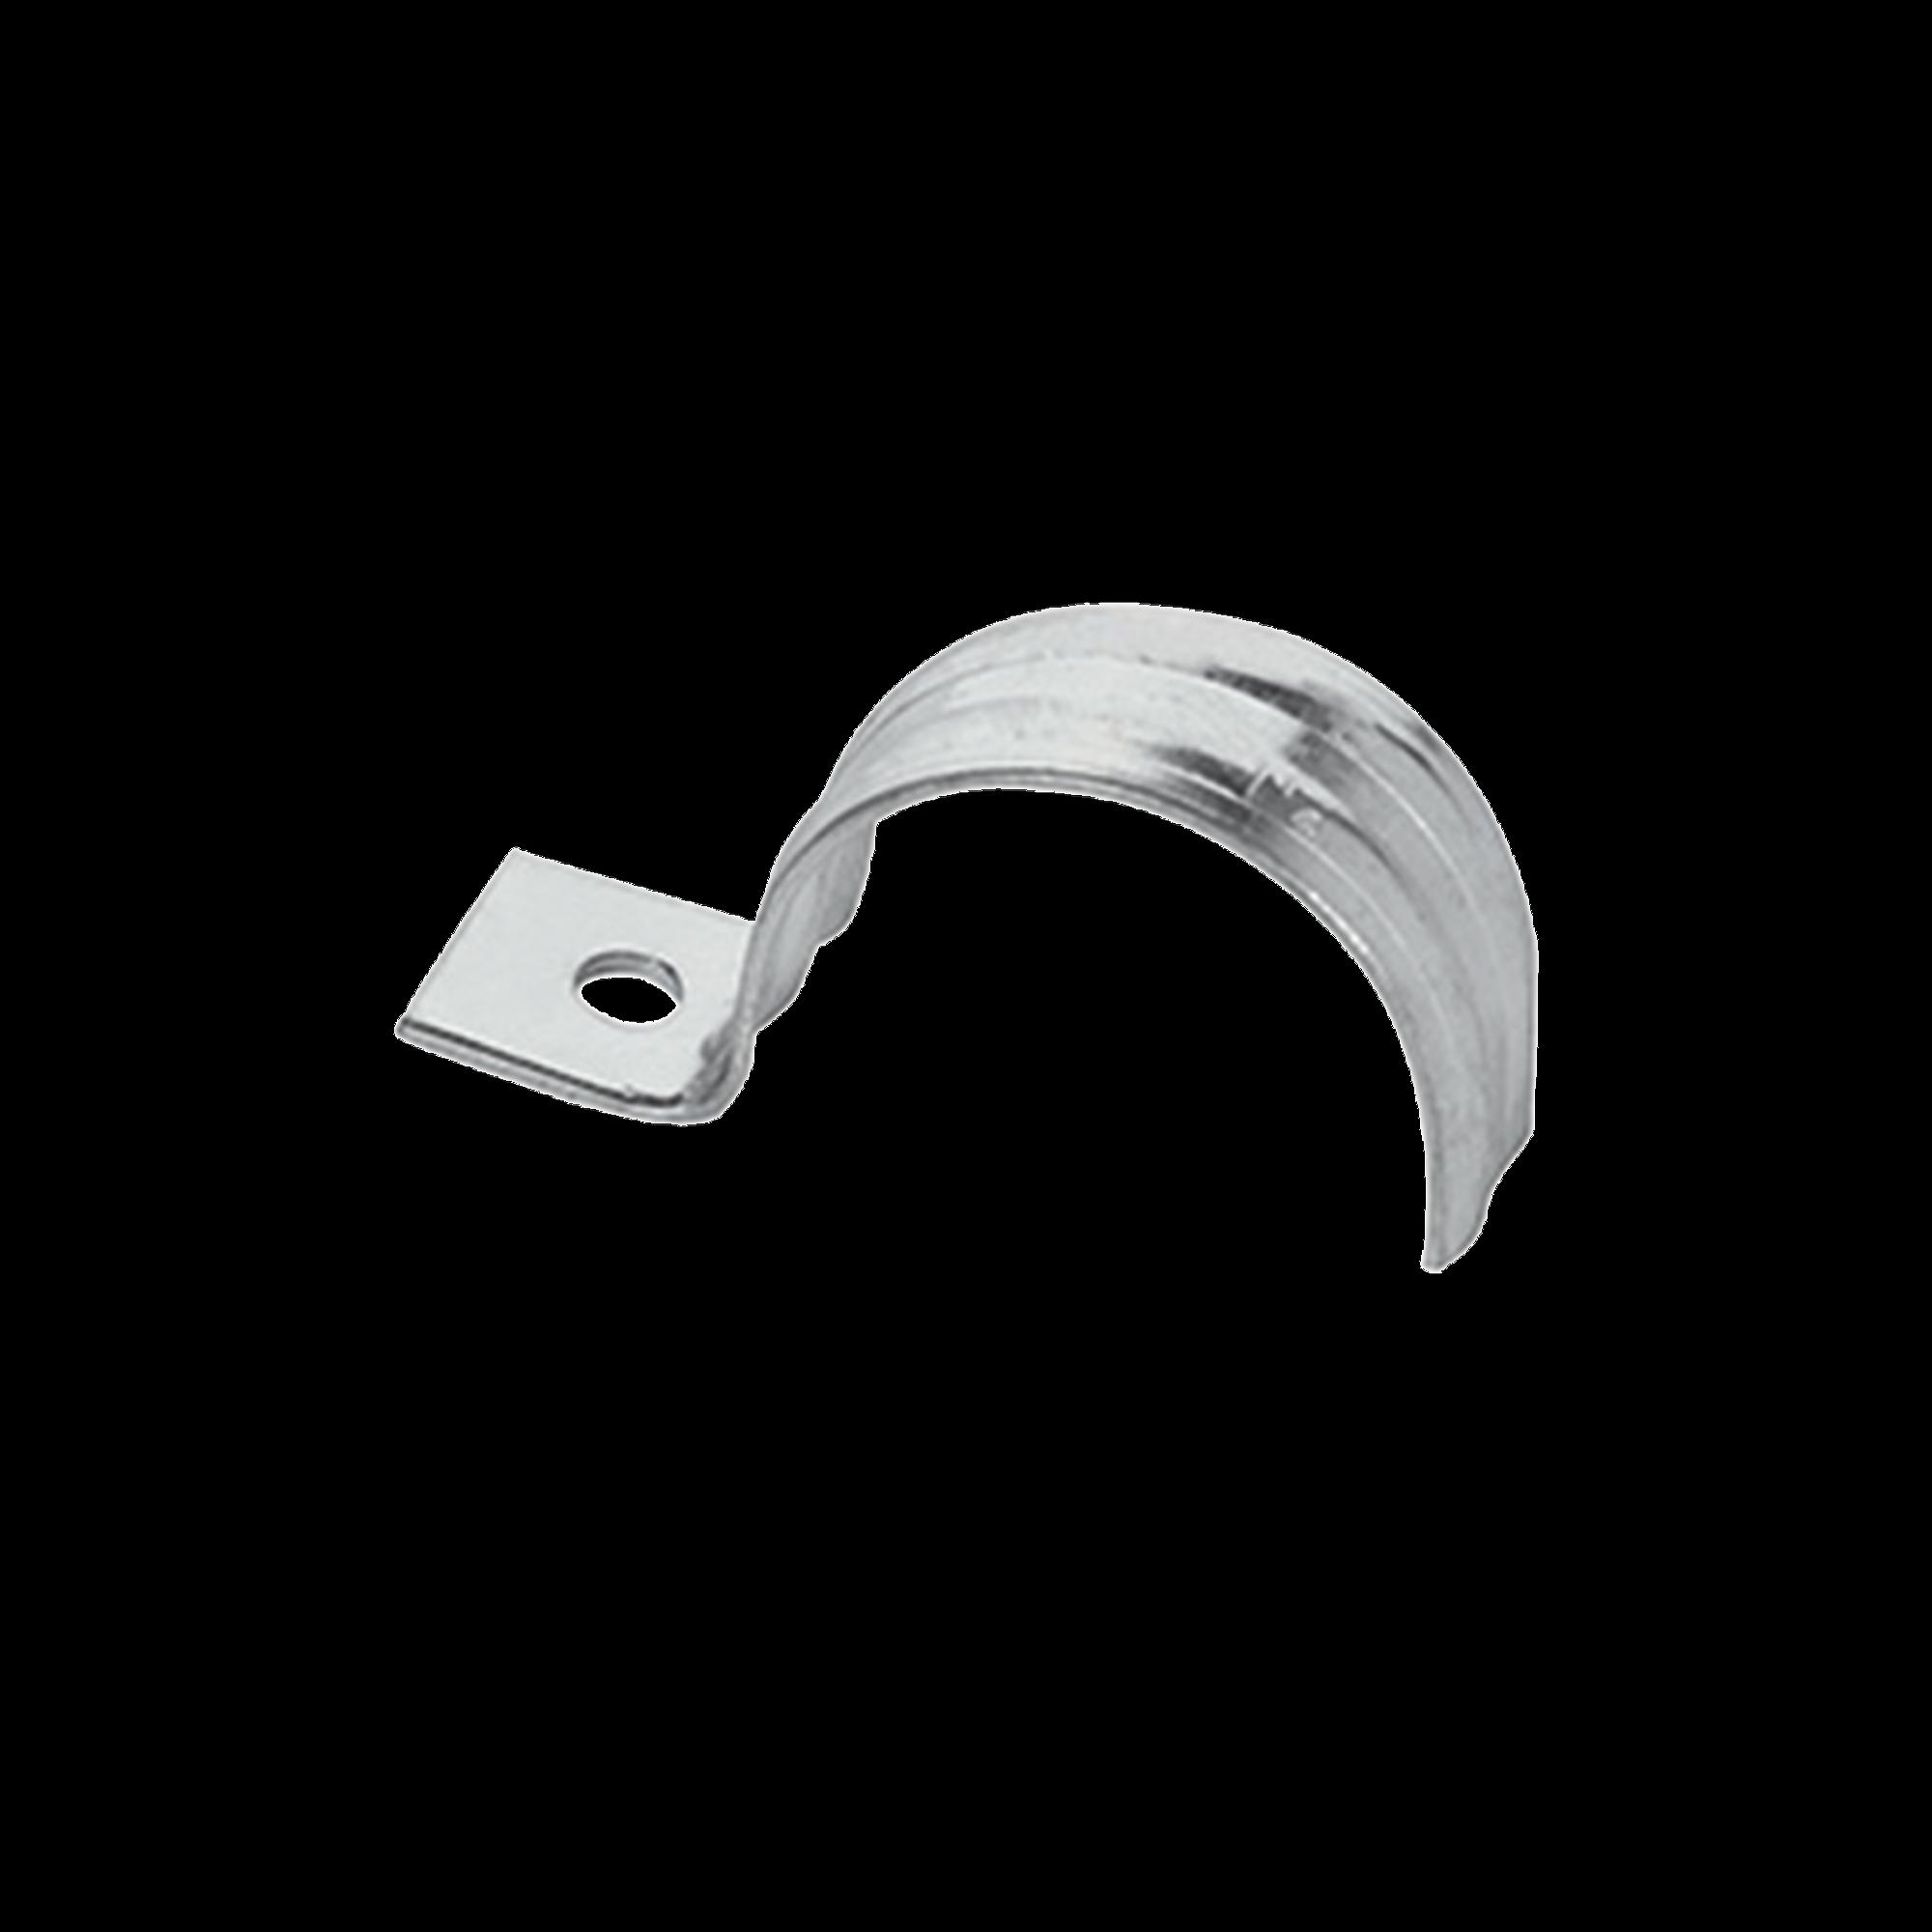 Abrazadera para tubo tipo uña 1/2 bolsa con 10 piezas